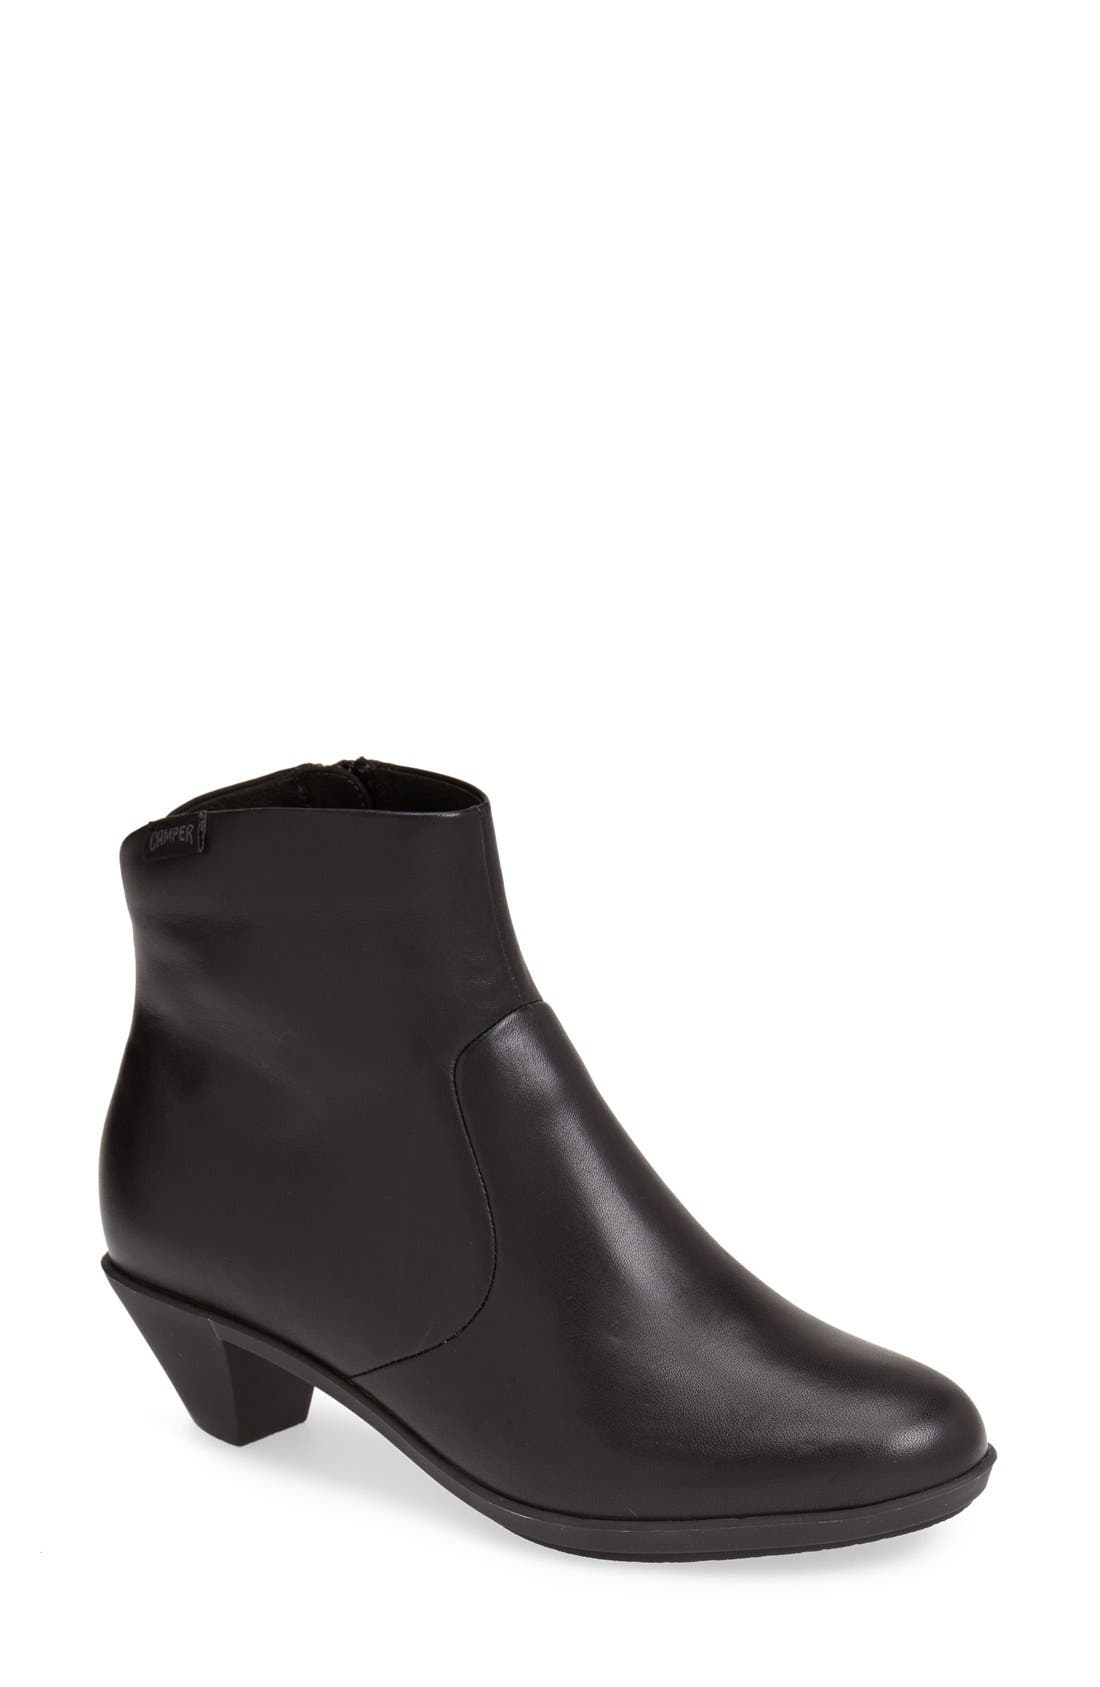 'Agatha' Ankle Boot, Main, color, 001